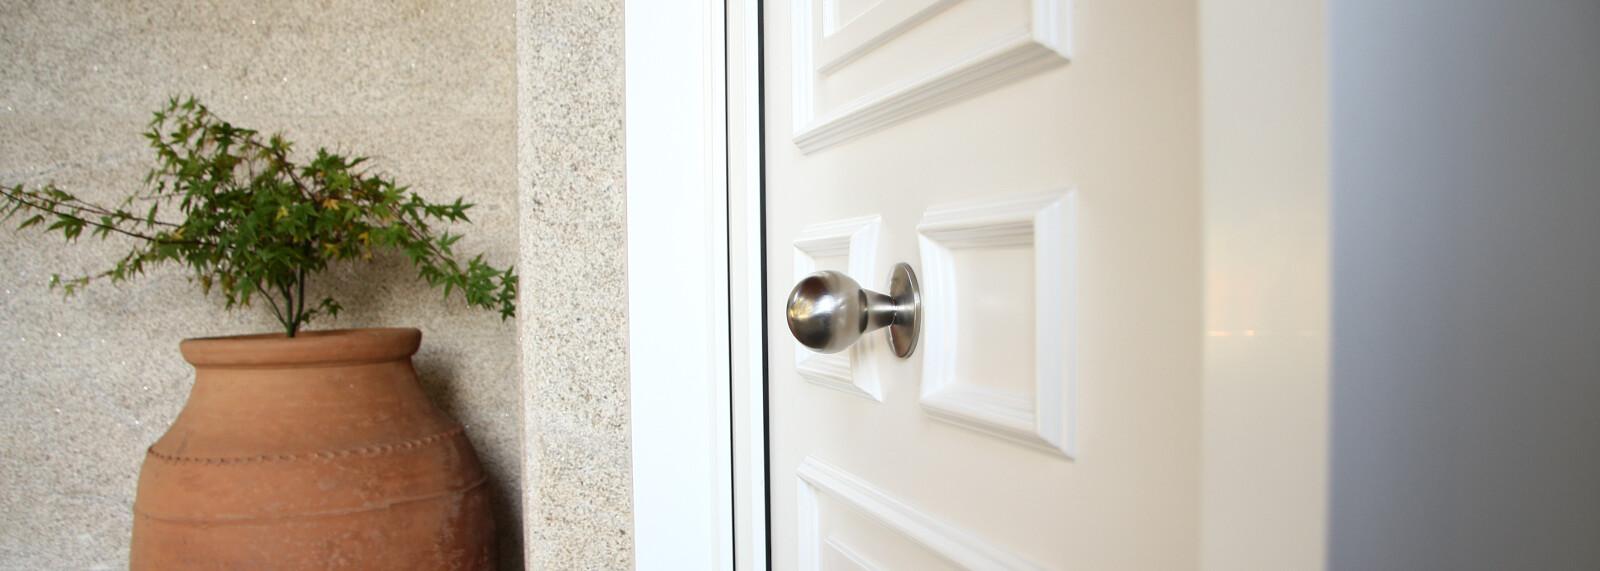 Pomos puerta ingadesa